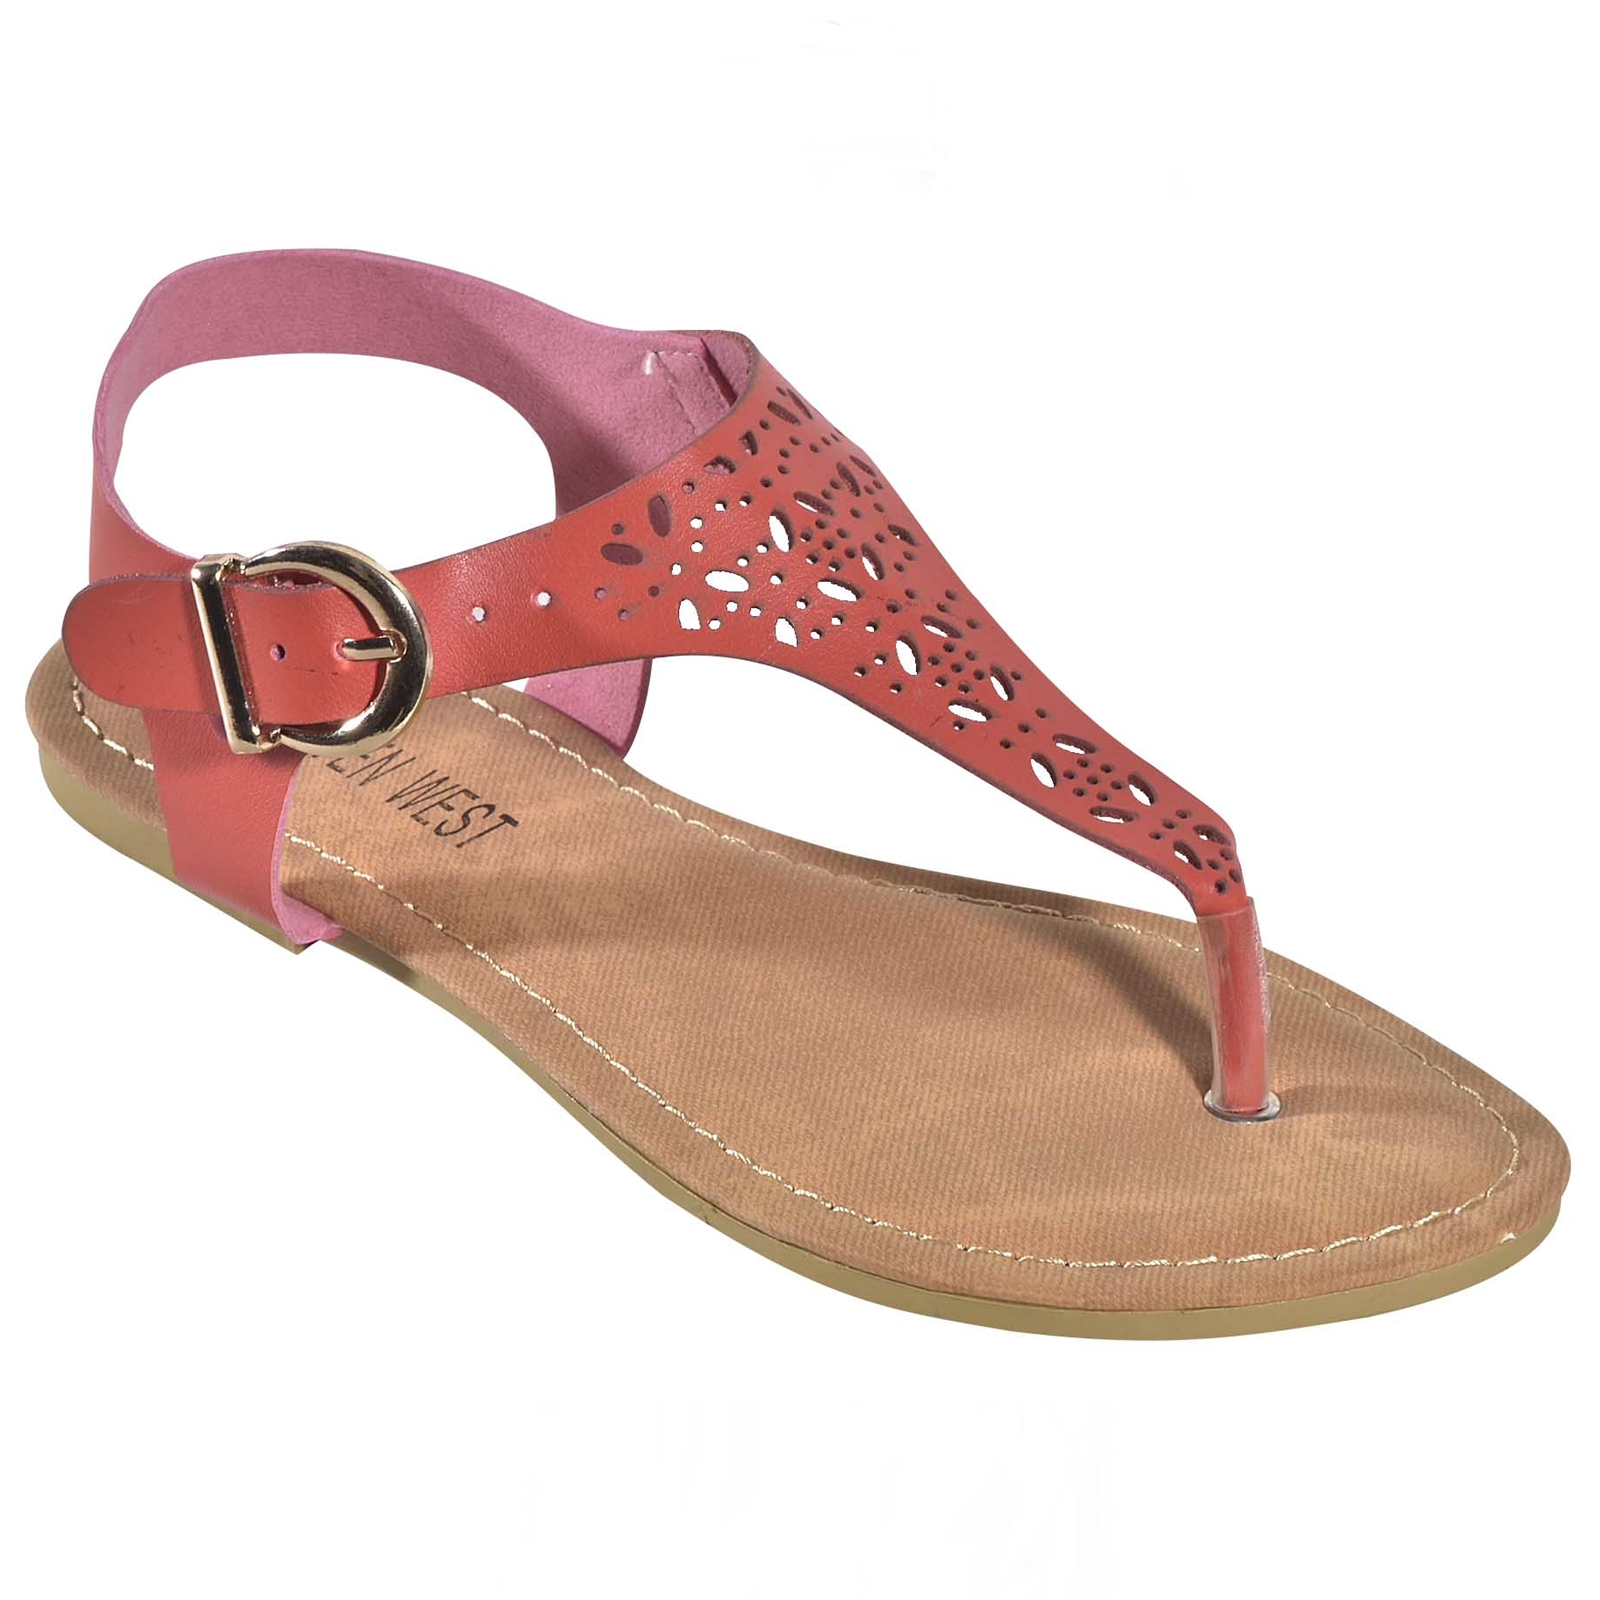 Womens Cutout TStrap Thongs Slingback Strappy Roman Gladiator Flat Sandals